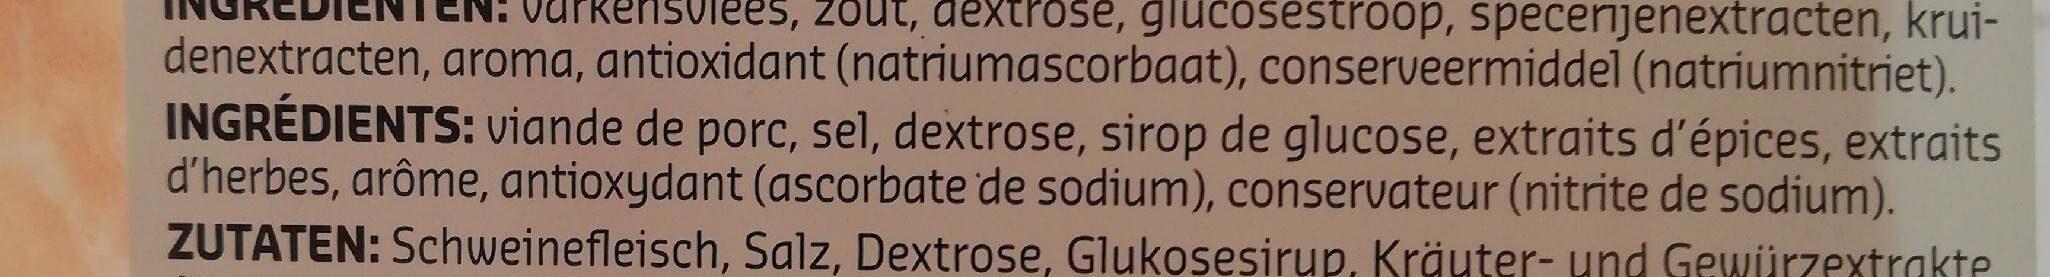 Jambon cuit dégraissé - Ingrediënten - fr